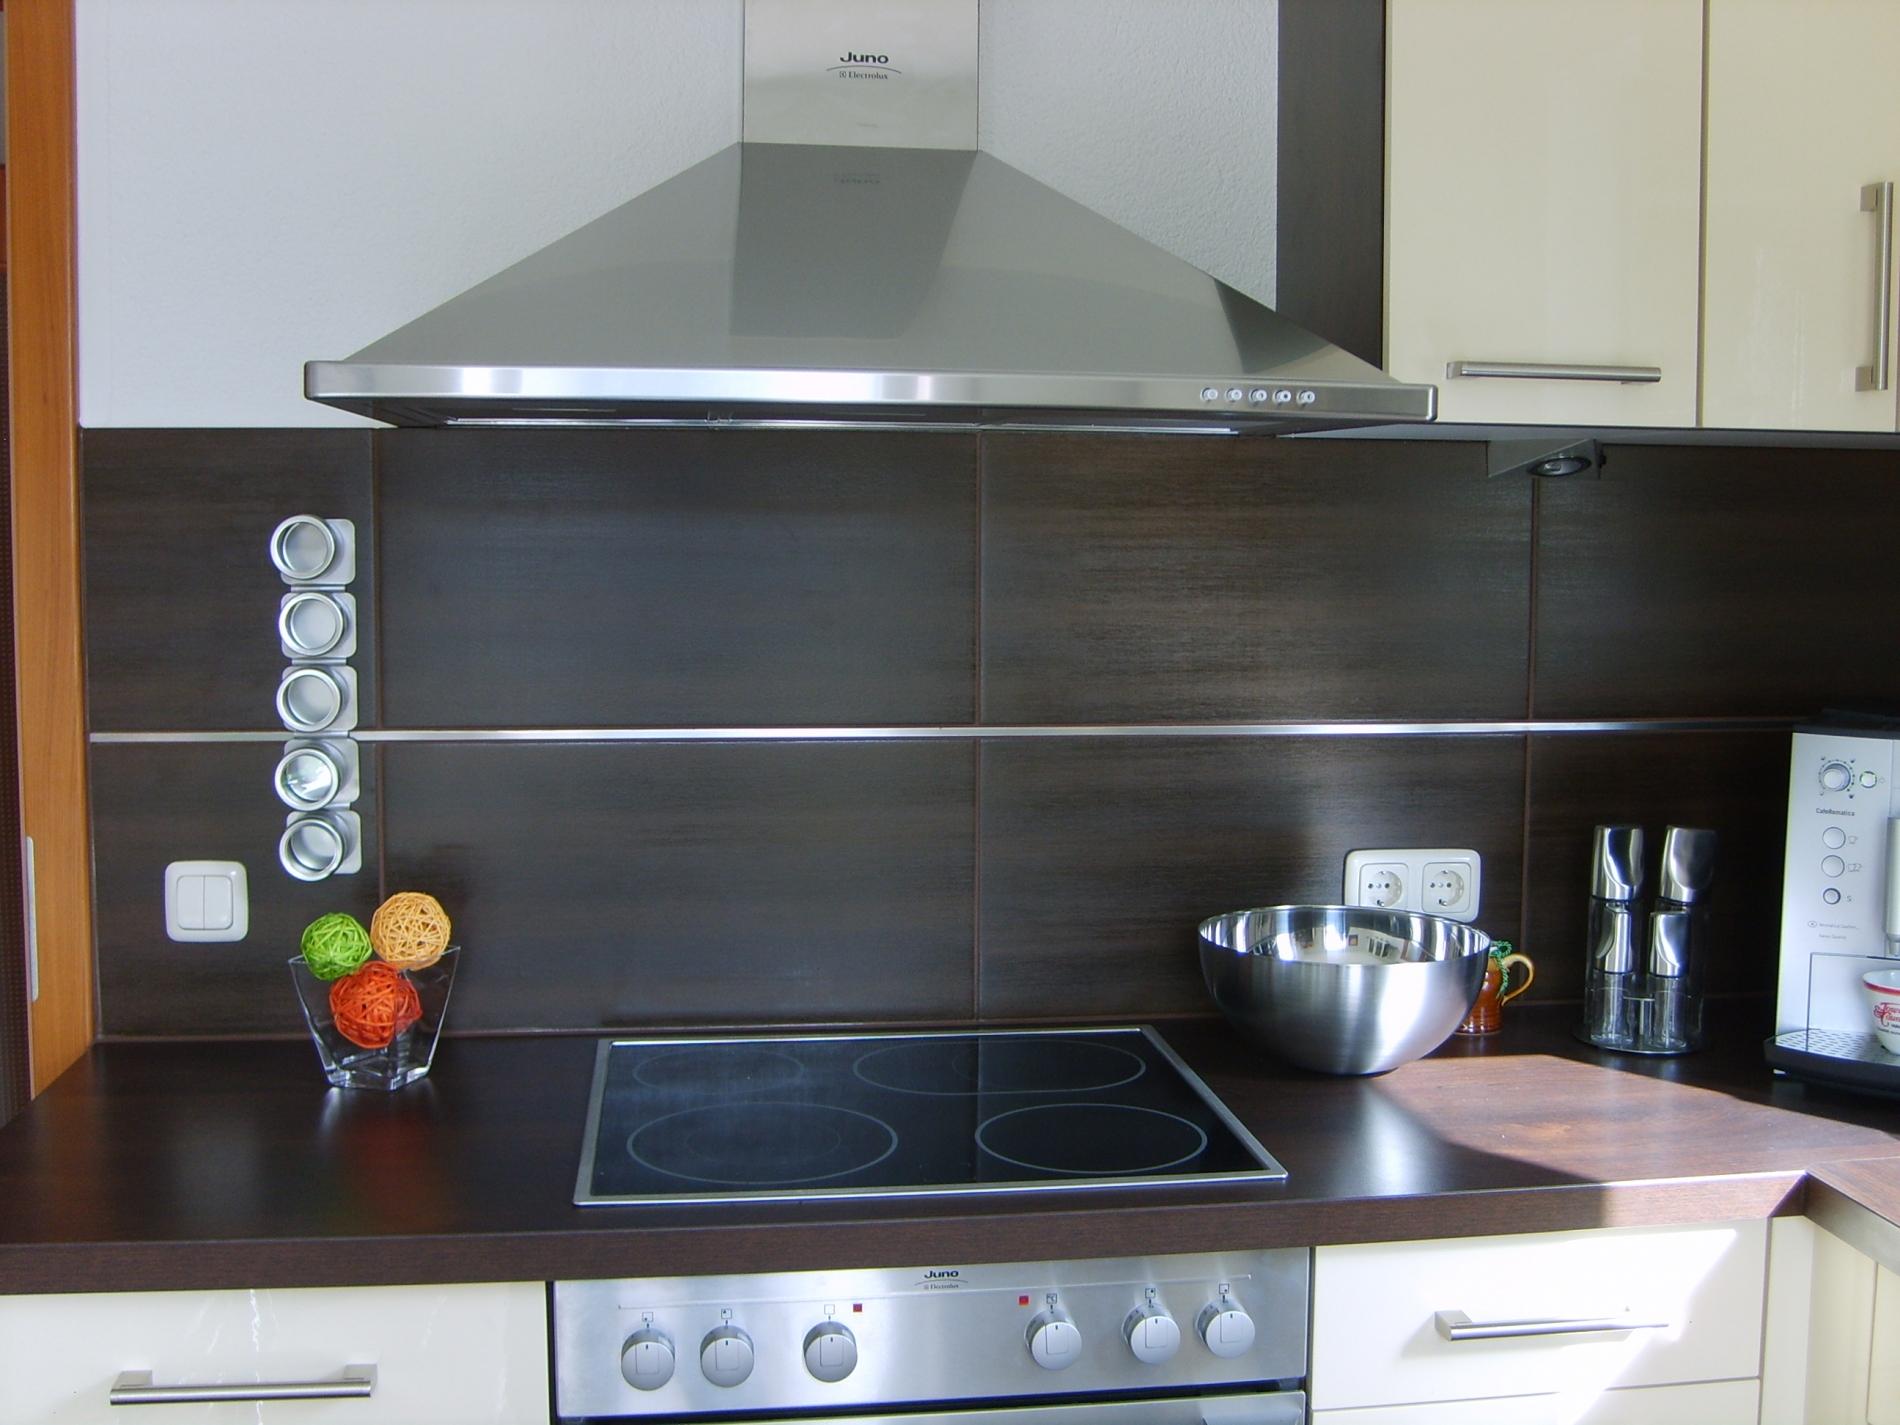 Full Size of Fliesenspiegel Verkleiden Kche Reinigen Retro Modern Bodenbelag Küche Glas Selber Machen Wohnzimmer Fliesenspiegel Verkleiden